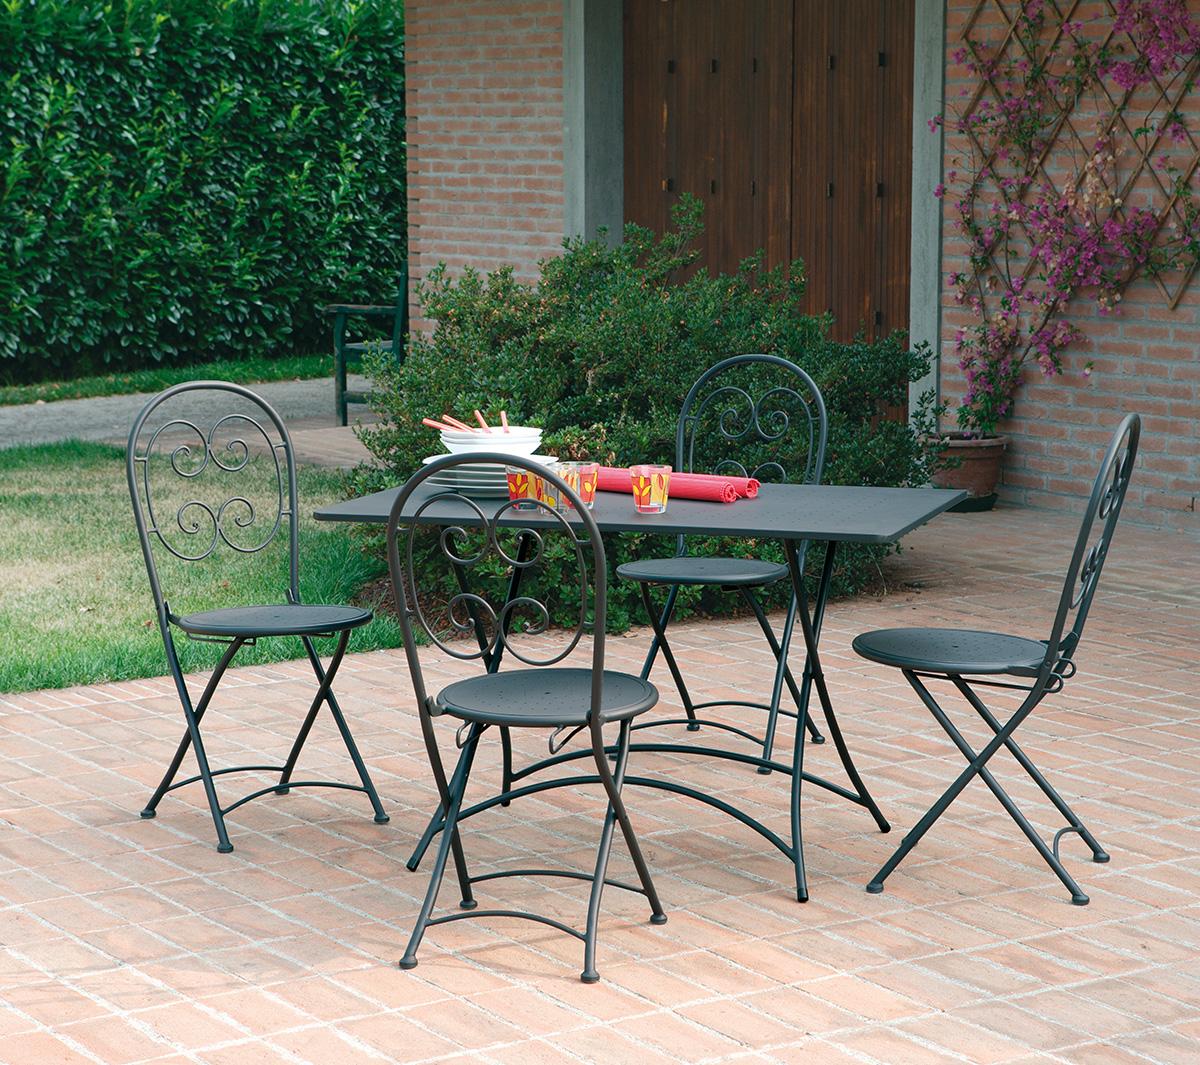 Mobili giardino ferro battuto : Mobili da giardino garden team ~ mobilia la tua casa